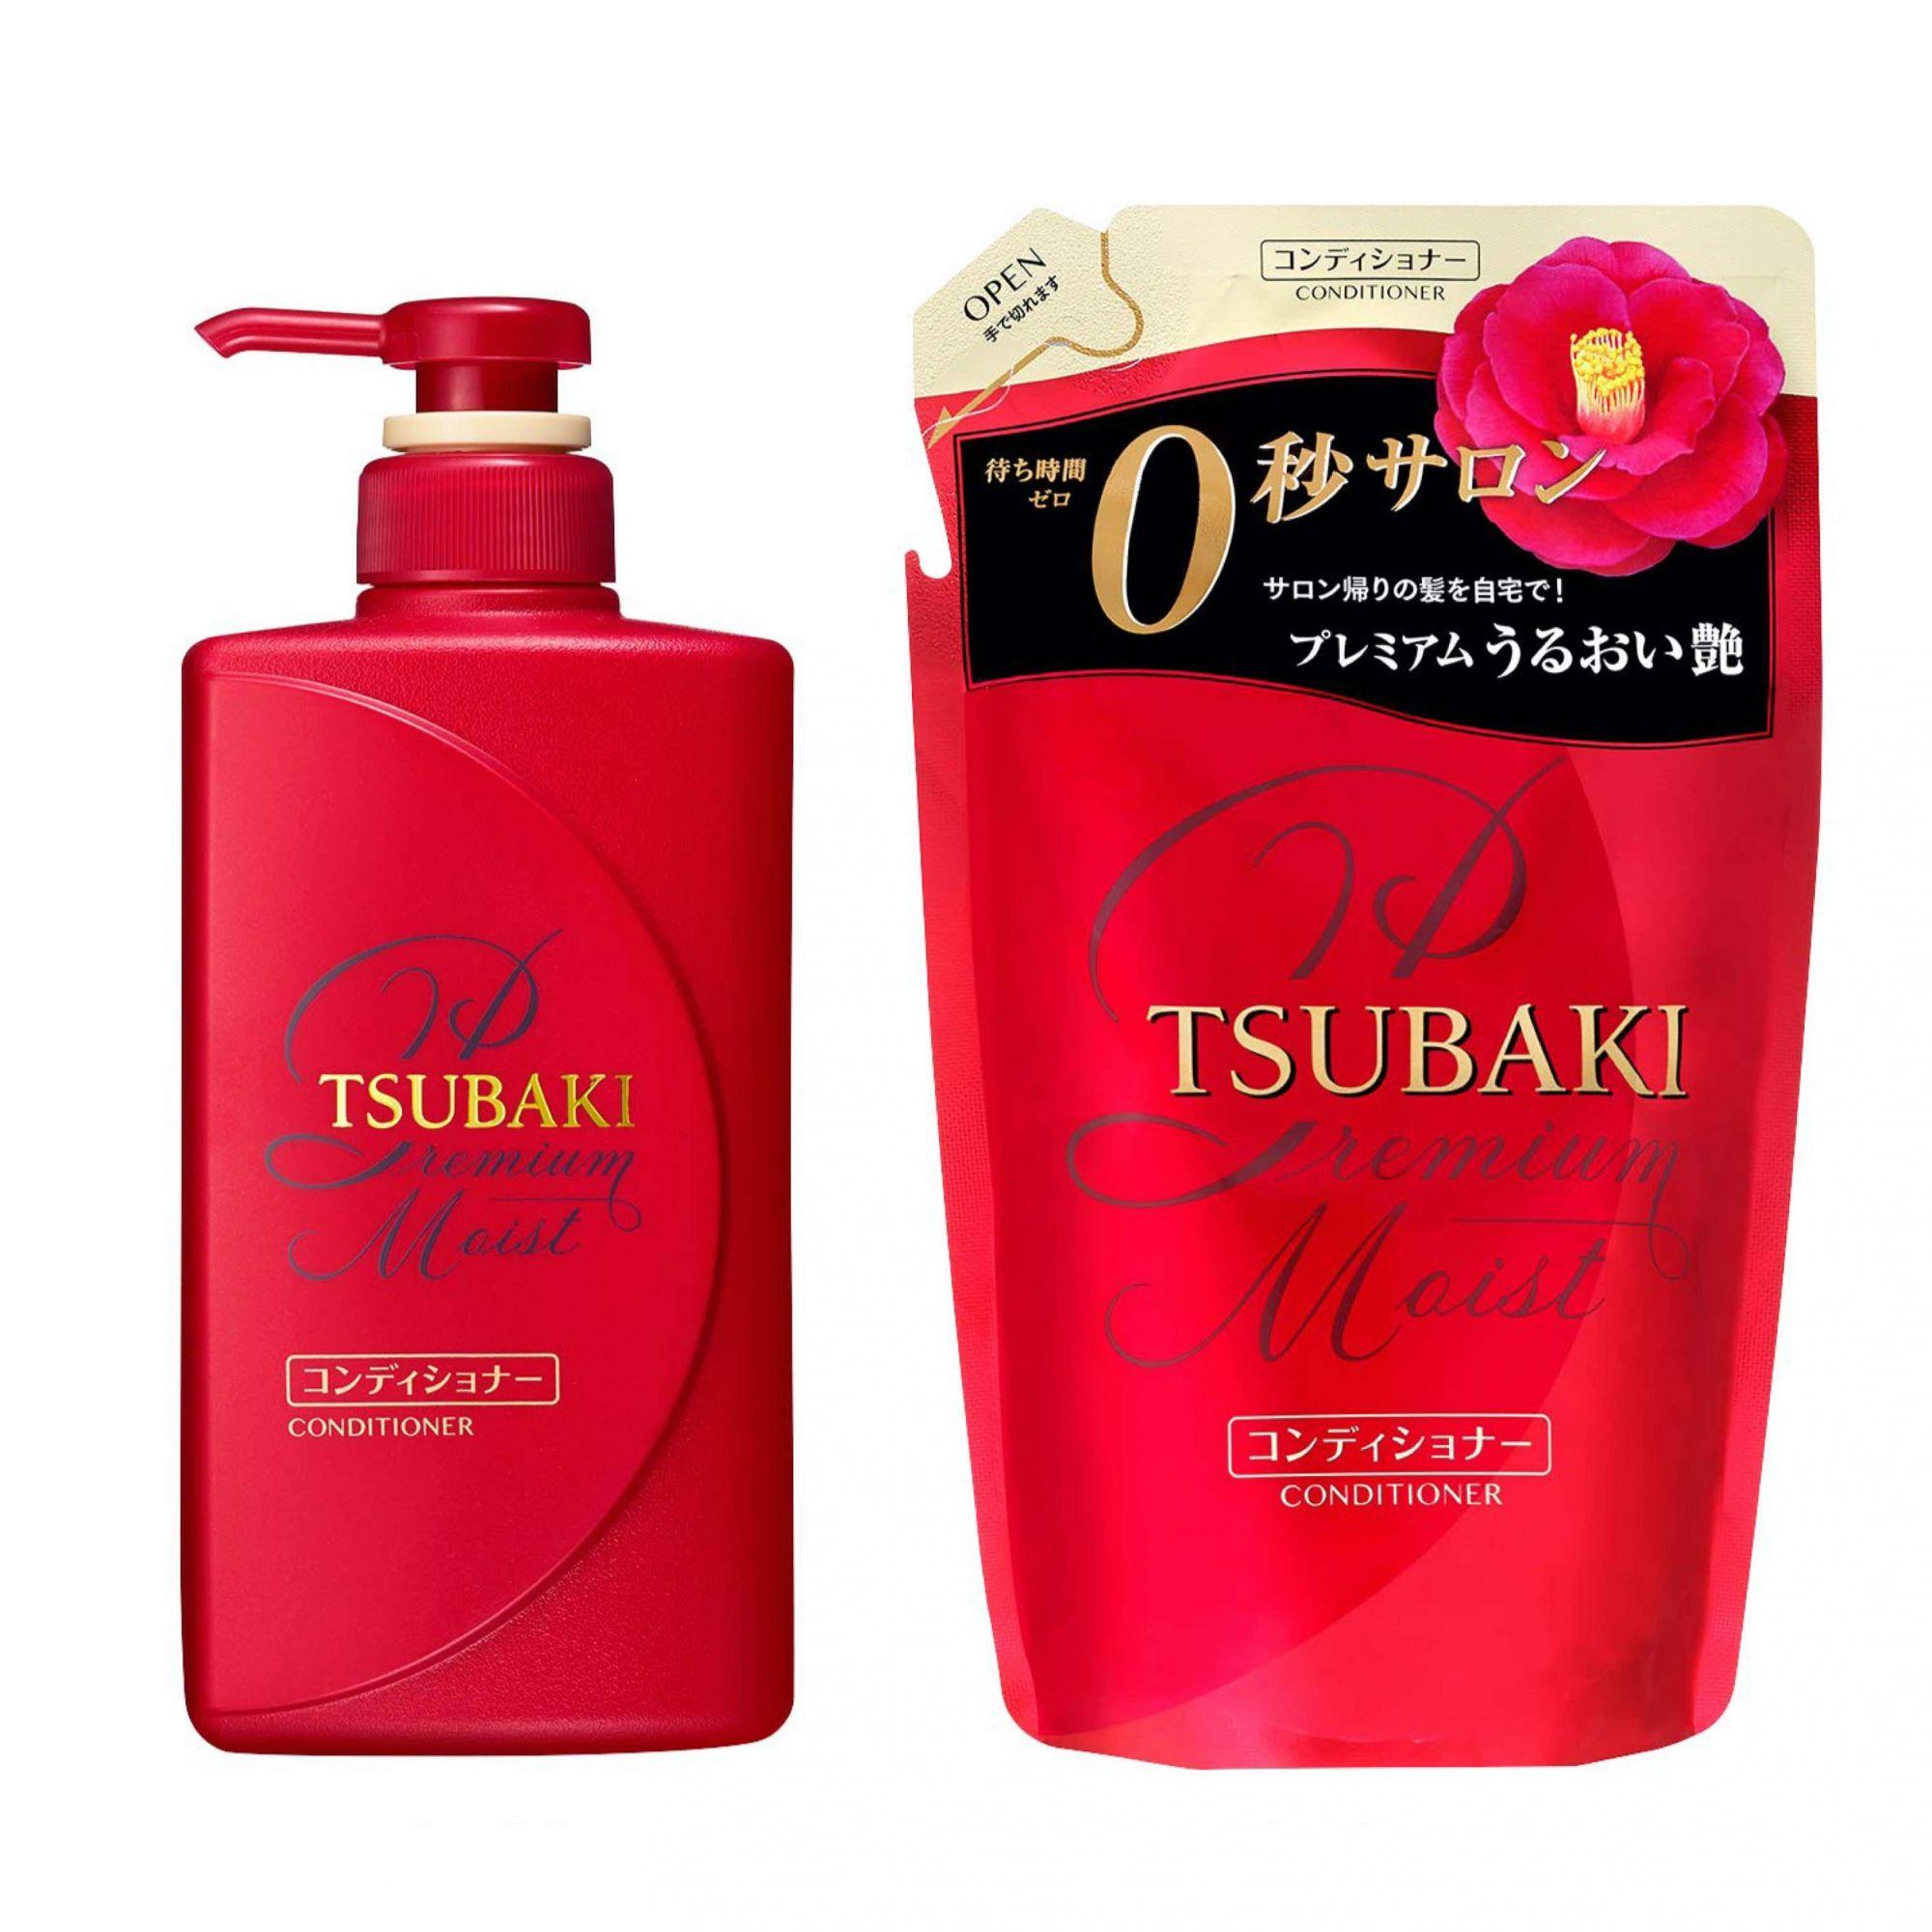 Shiseido Tsubaki Premium Moist Conditioner